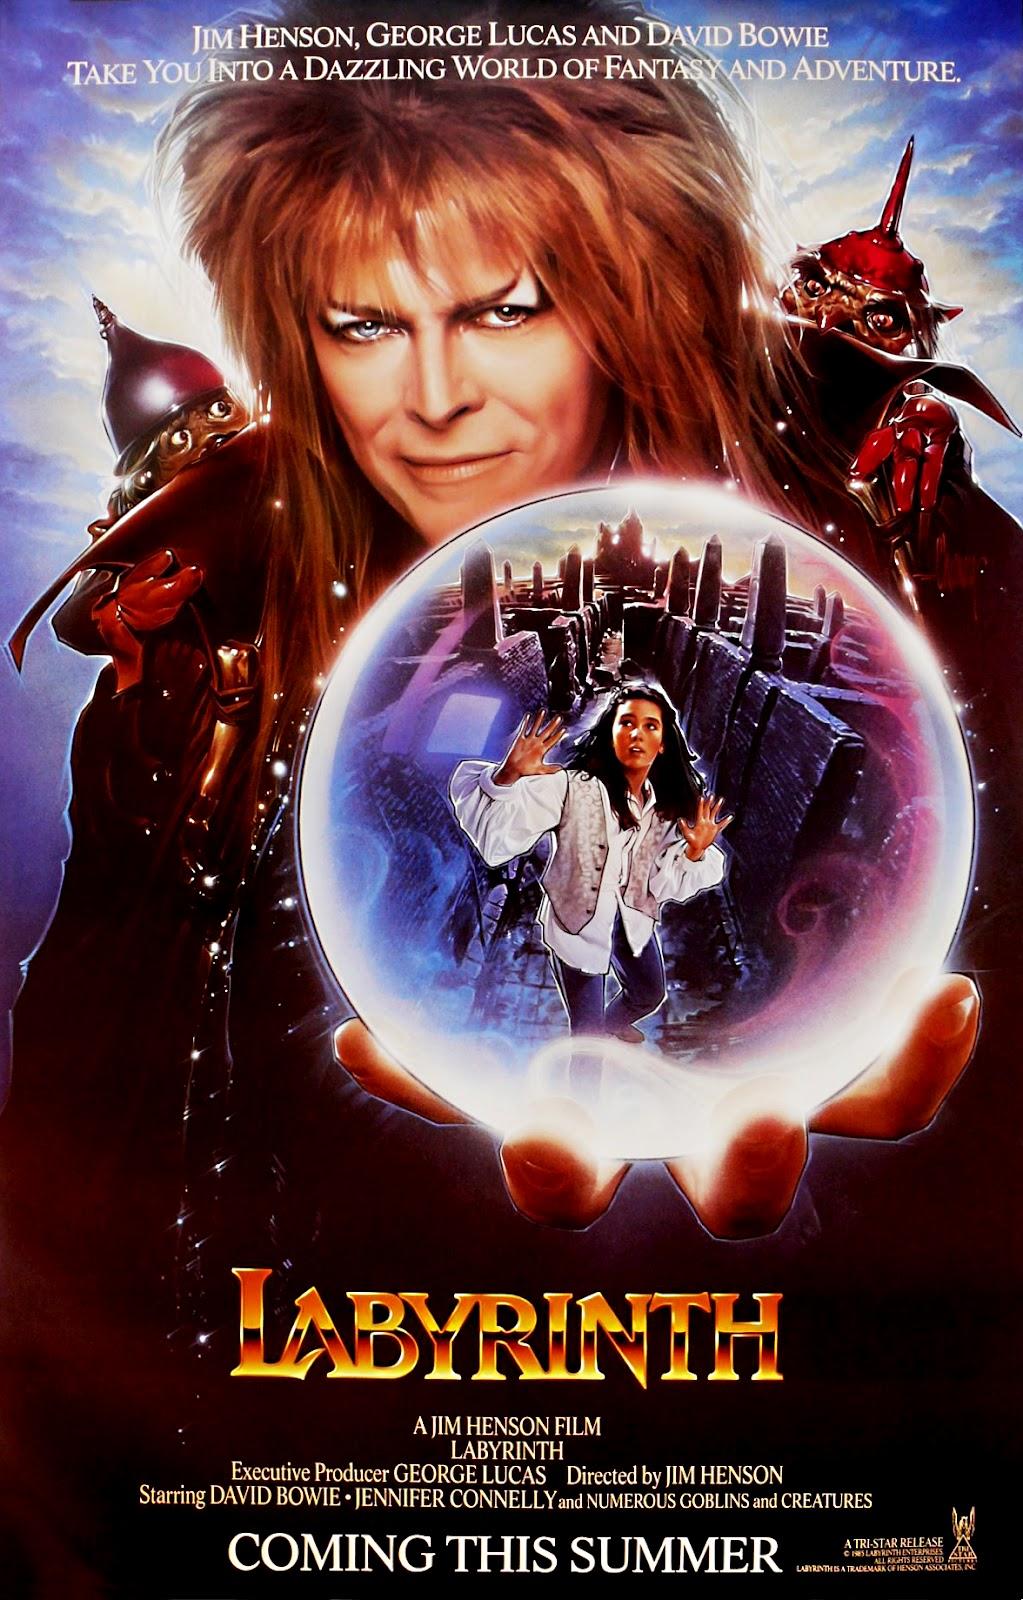 The Geeky Nerfherder: Movie Poster Art: Labyrinth (1986) Labyrinth 1986